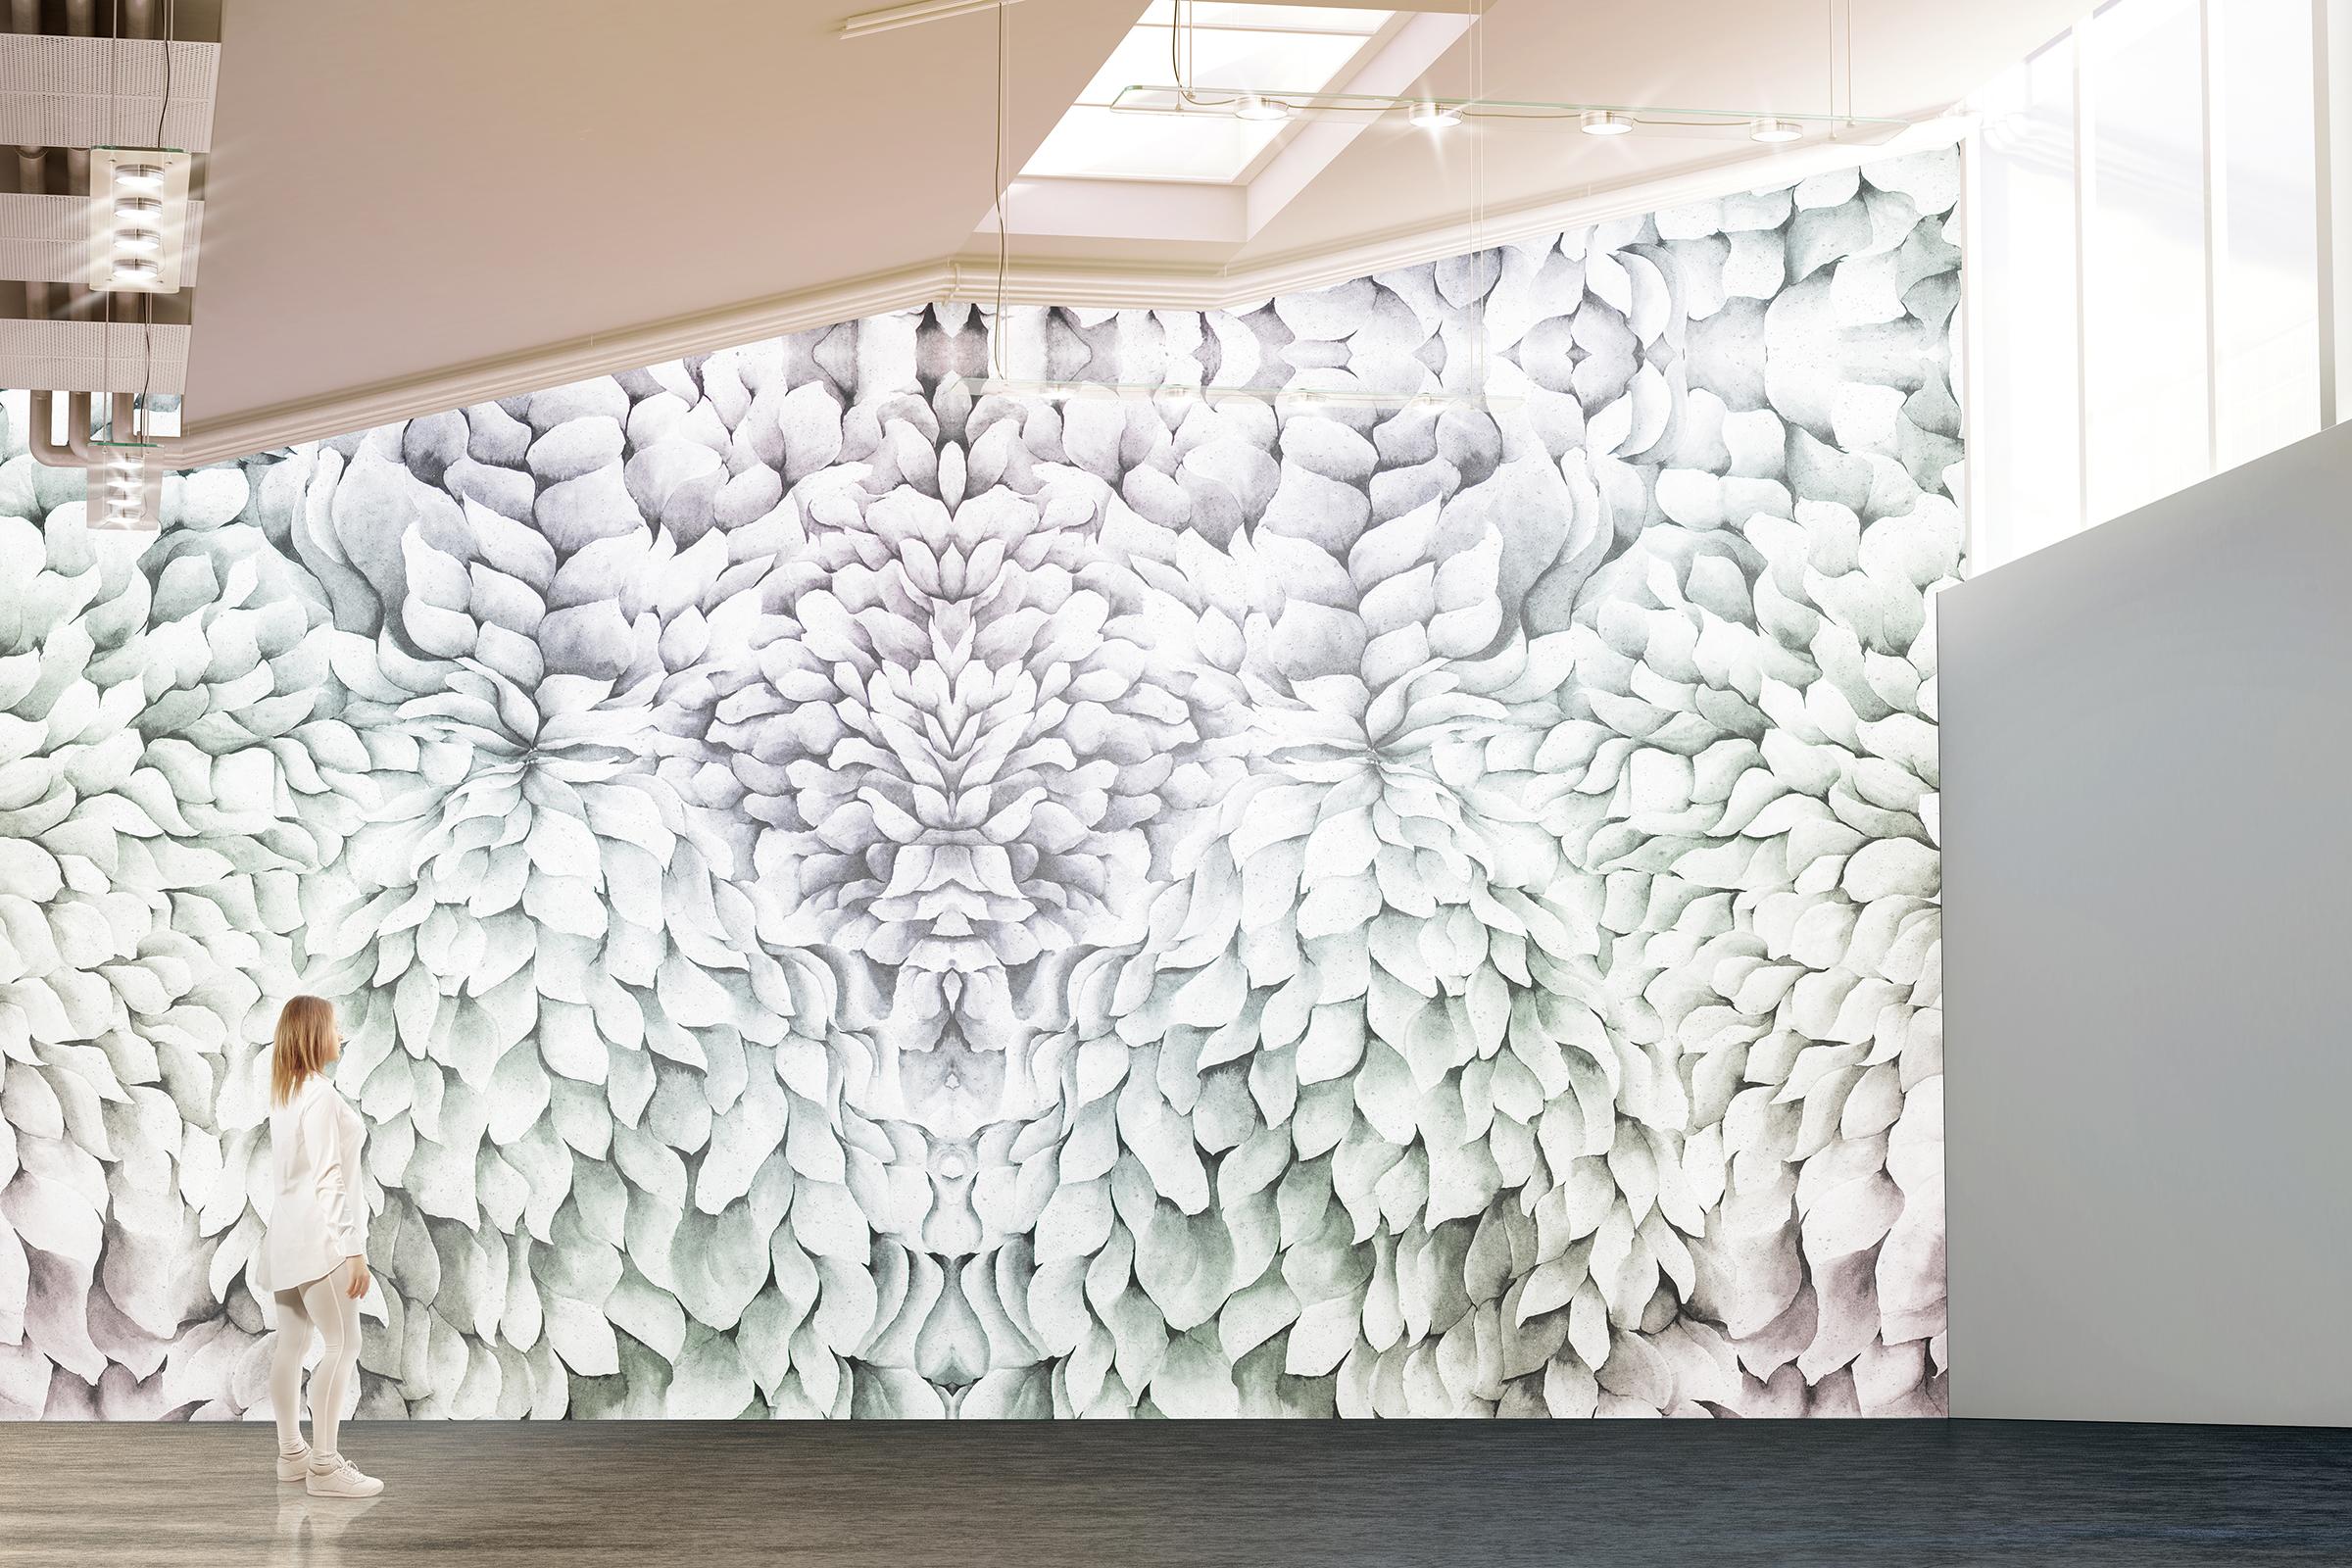 Bespoke Chrysanthemum Wall Papers -